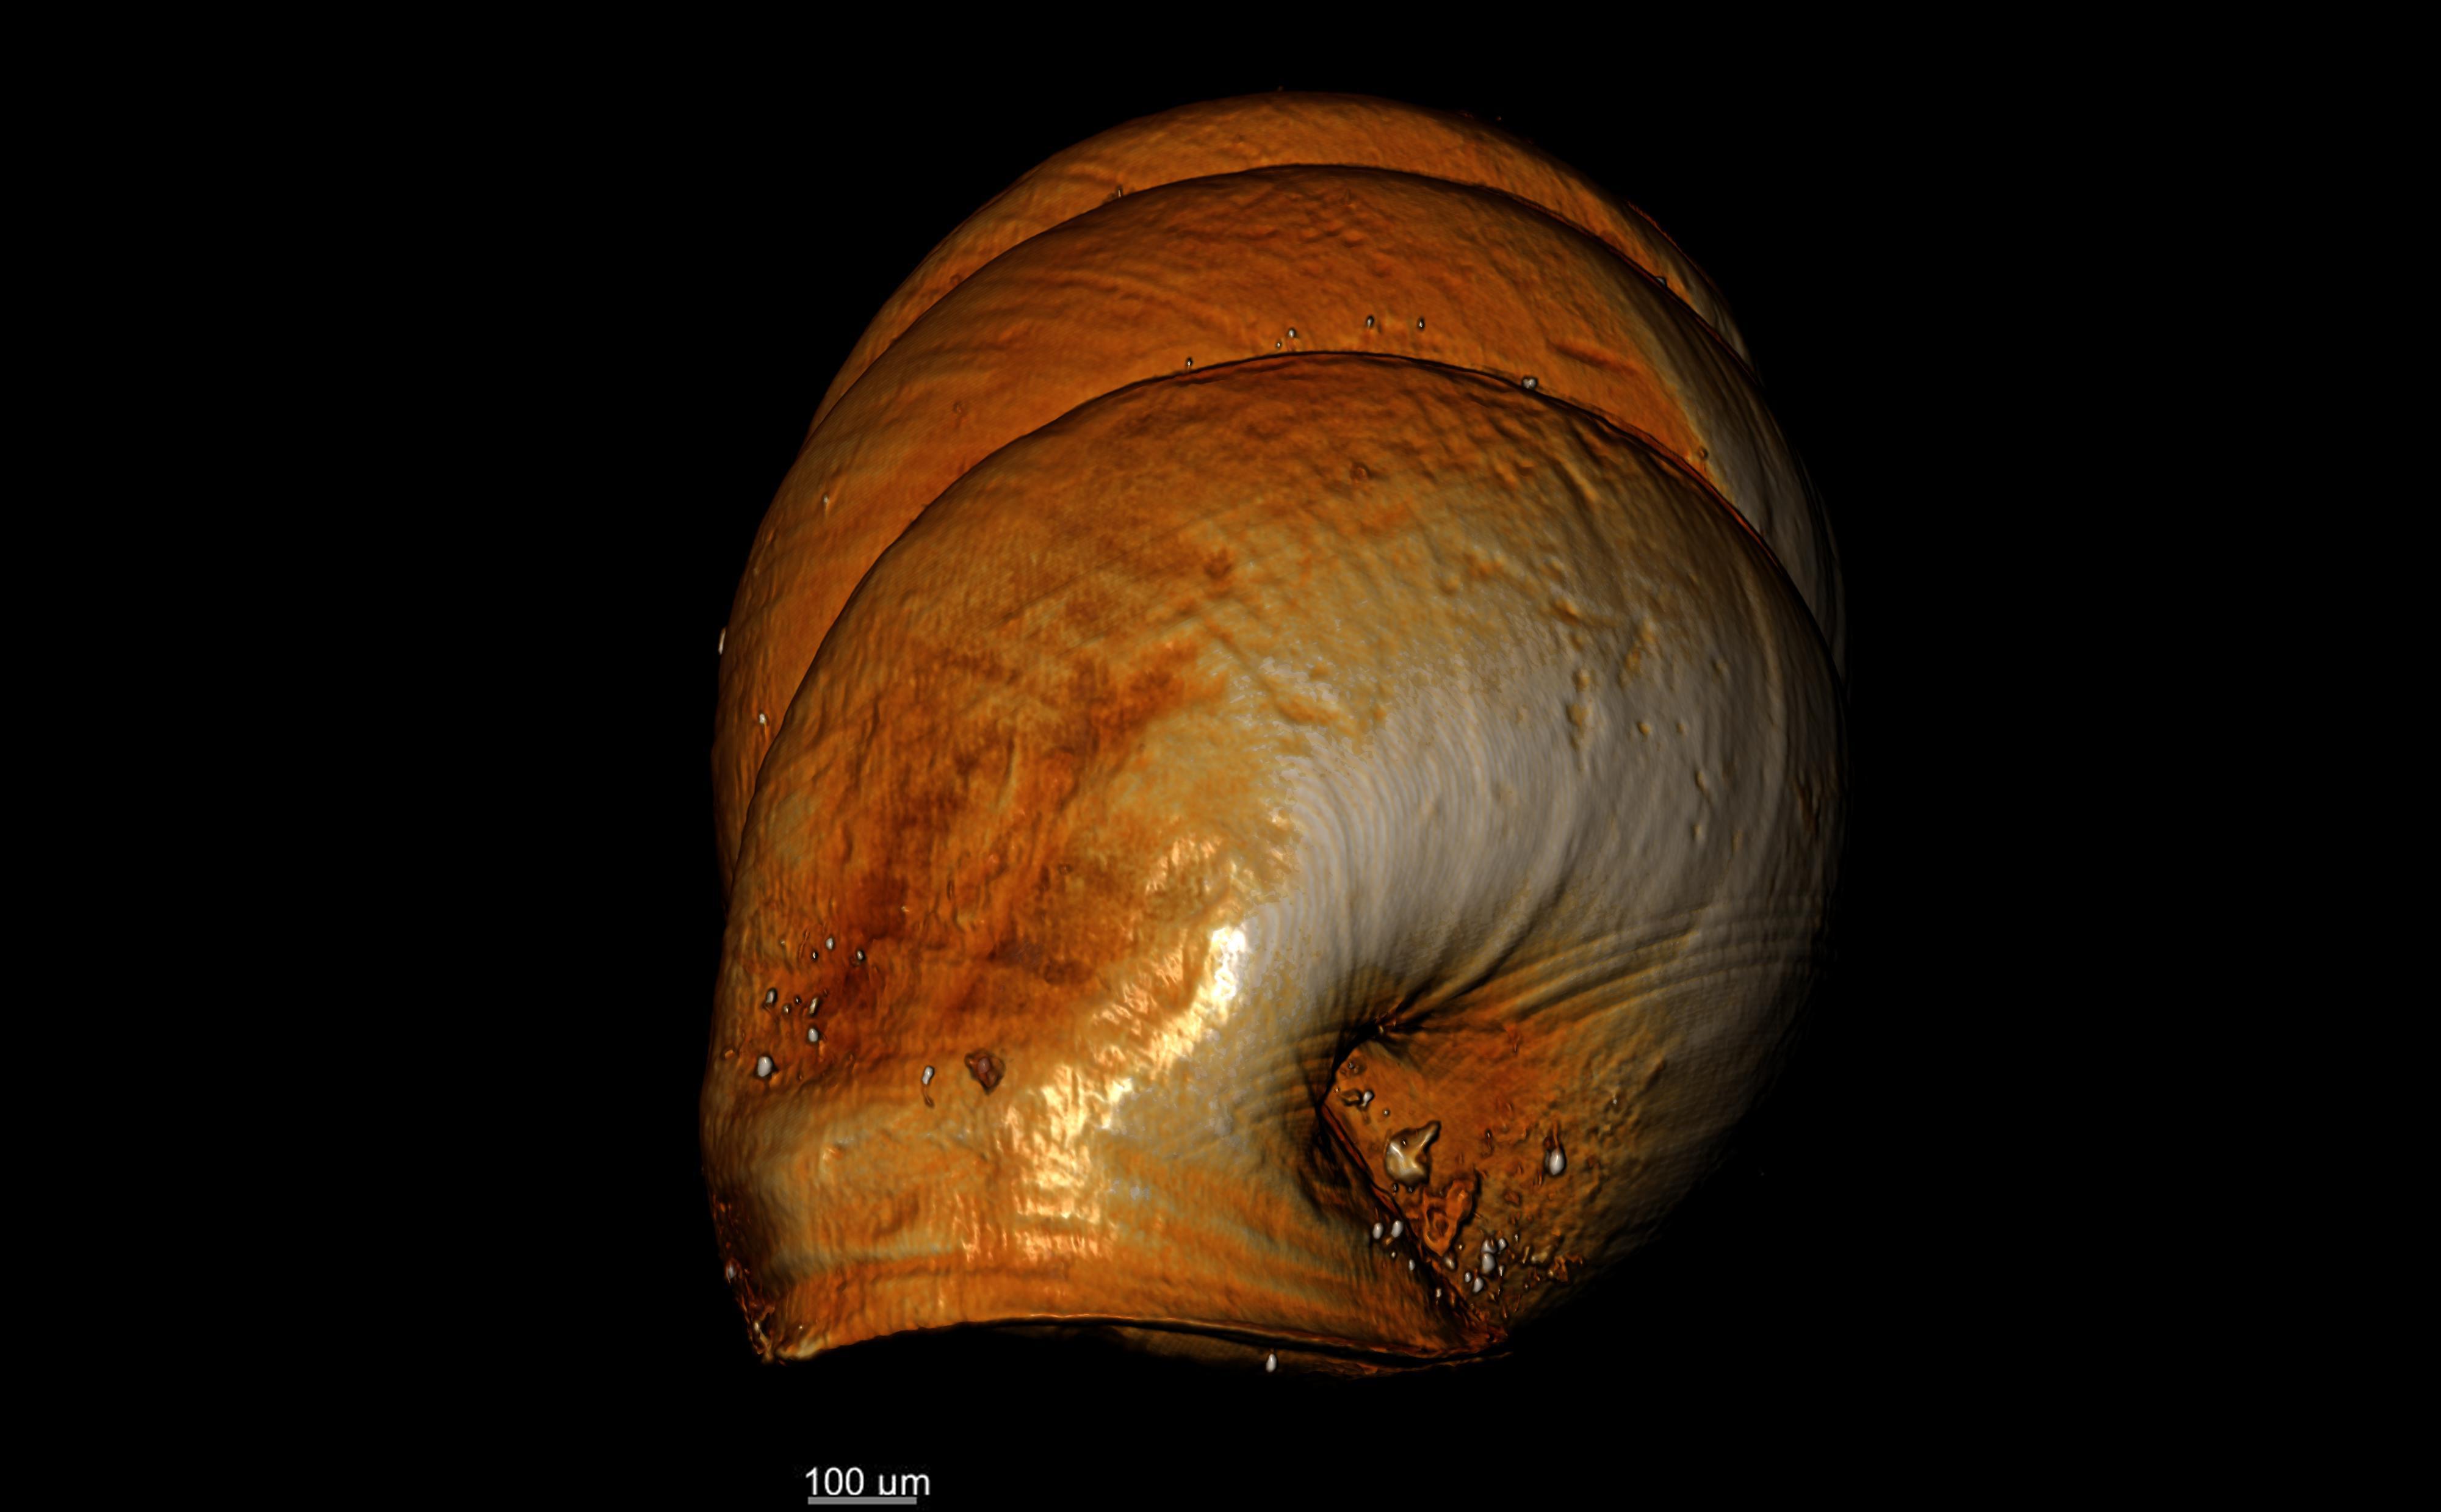 BE-RBINS-INV-TYPES-MT-2556-Gastrocopta-seignaciana-MCT-XRE-ANTERIOR.jpg